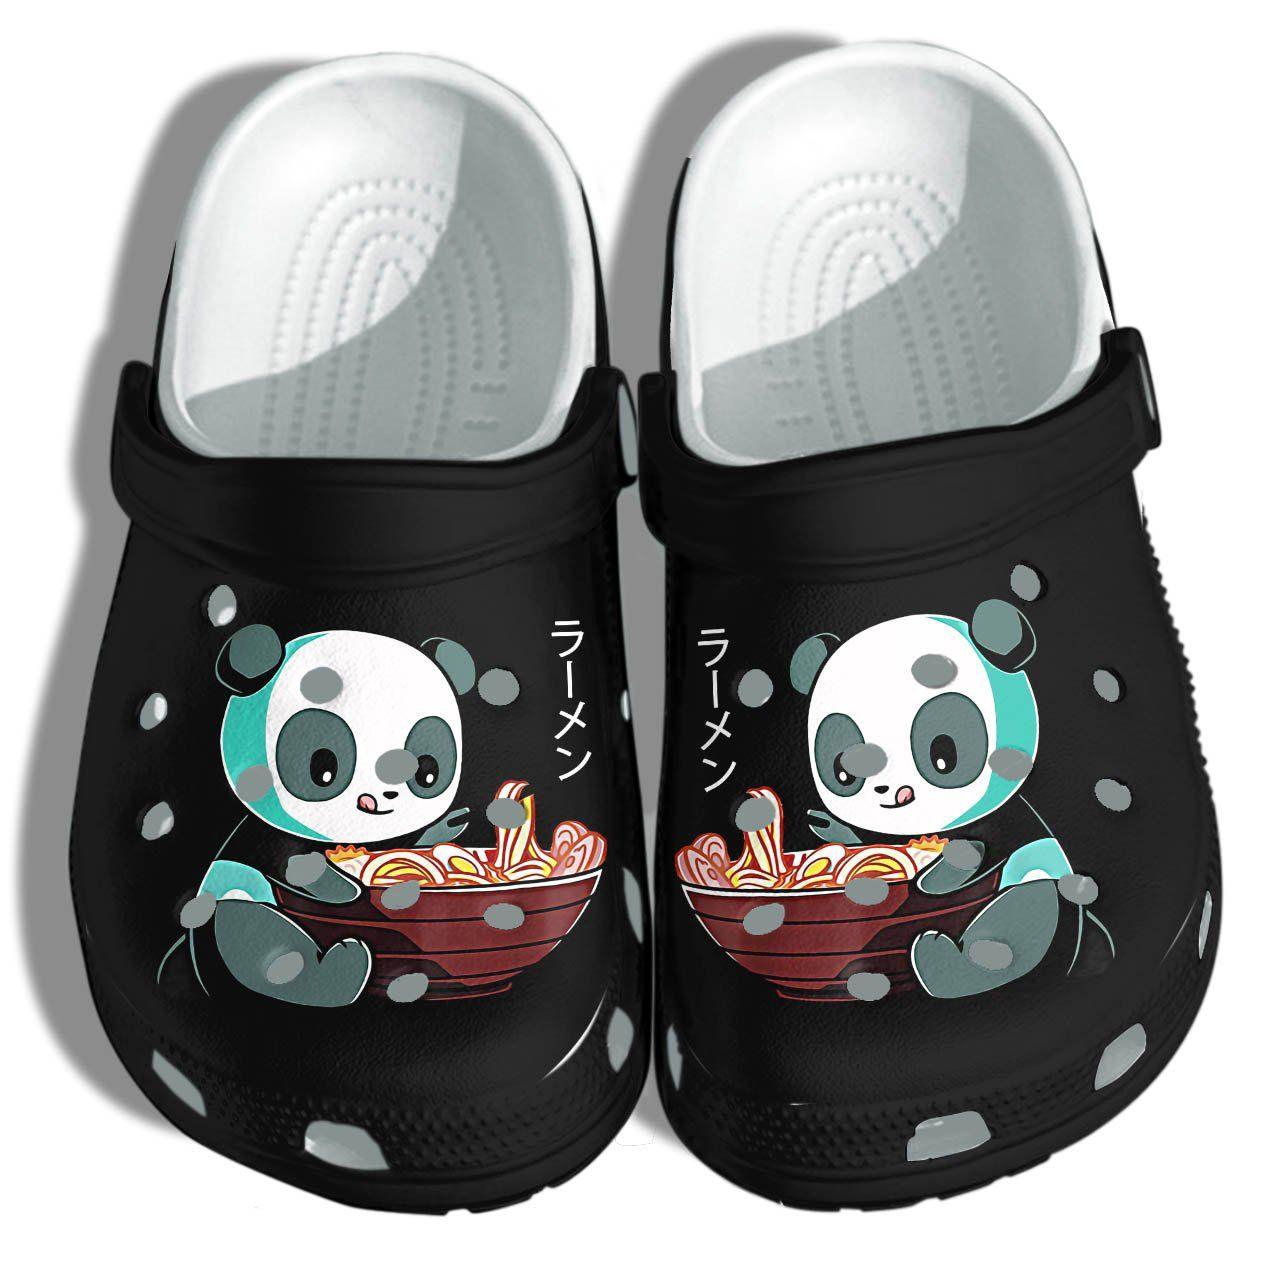 Photo of Panda Shoes Croc – Anime Panda Noodle Japan Shoes Croc For Men Women Who Love Panda